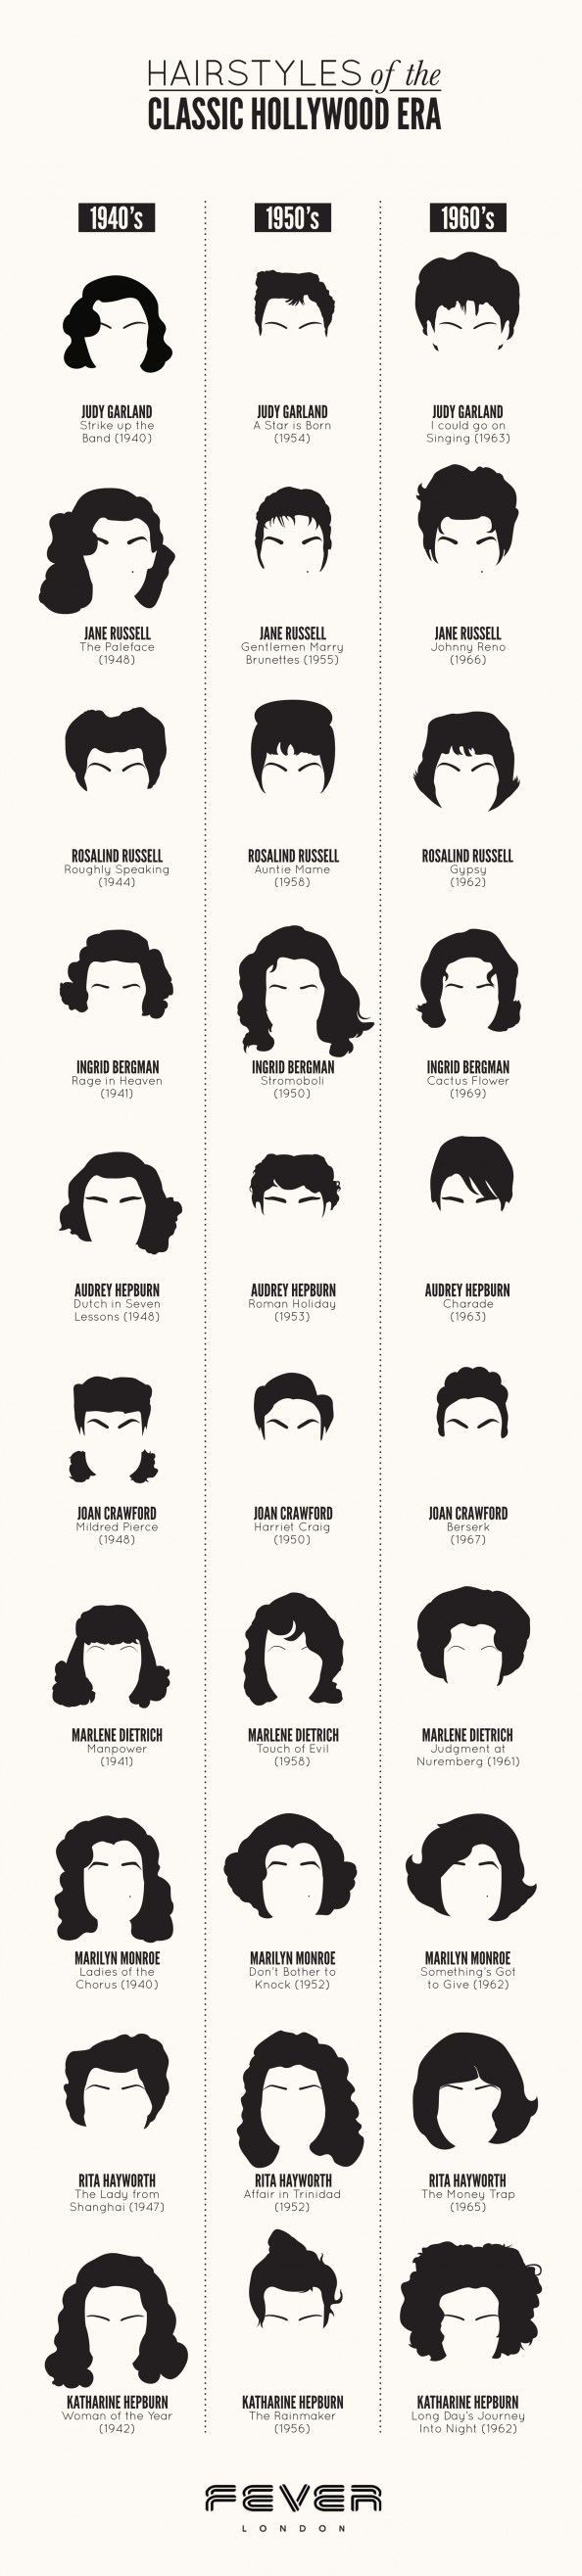 best us makeup images on pinterest fashion vintage hair